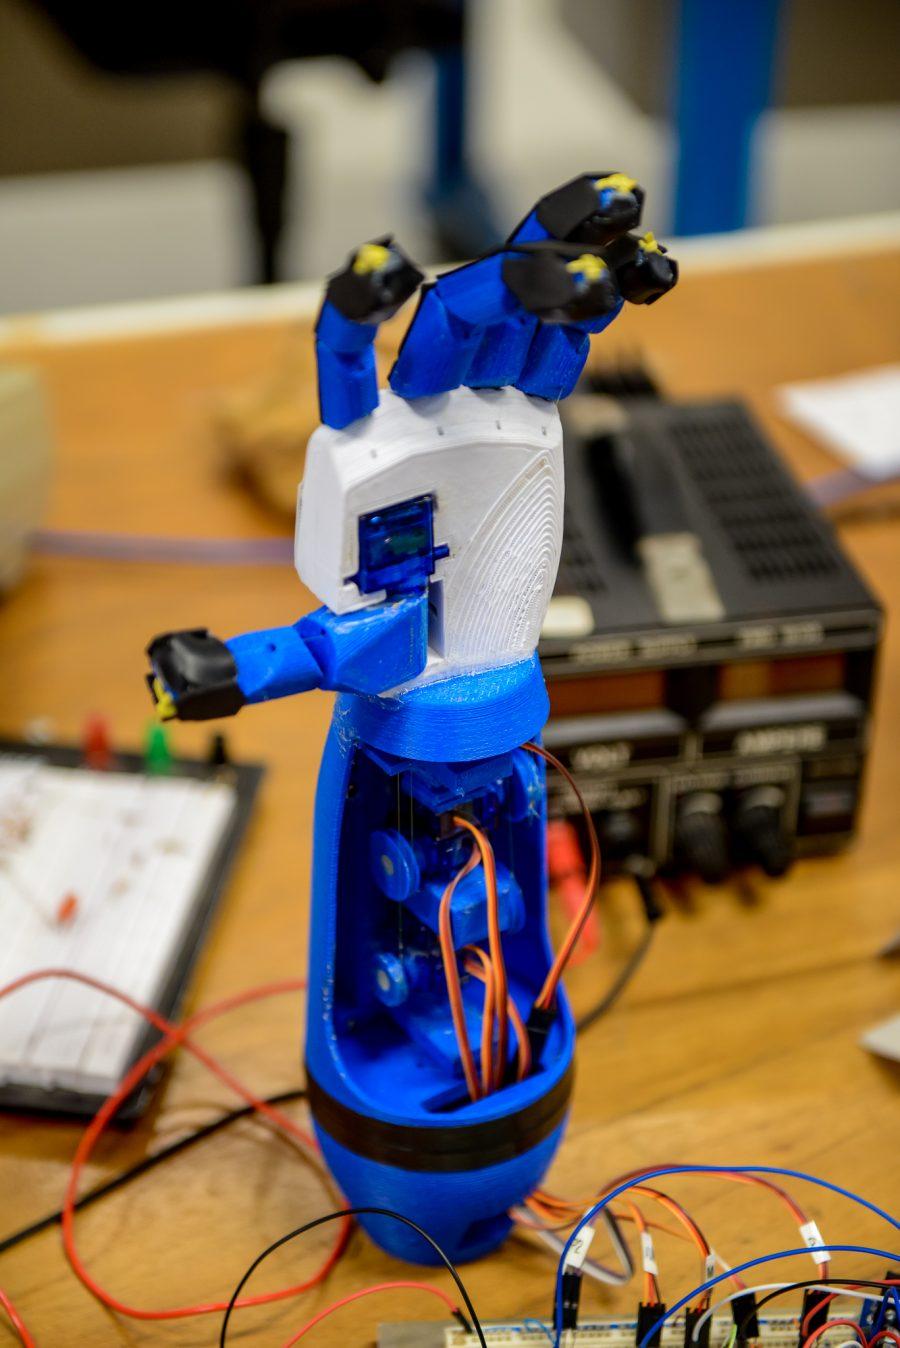 Protótipo de prótese desenvolvido na UFPR: movimentos por sinais cerebrais (Foto: Marcos Solivan/UFPR)